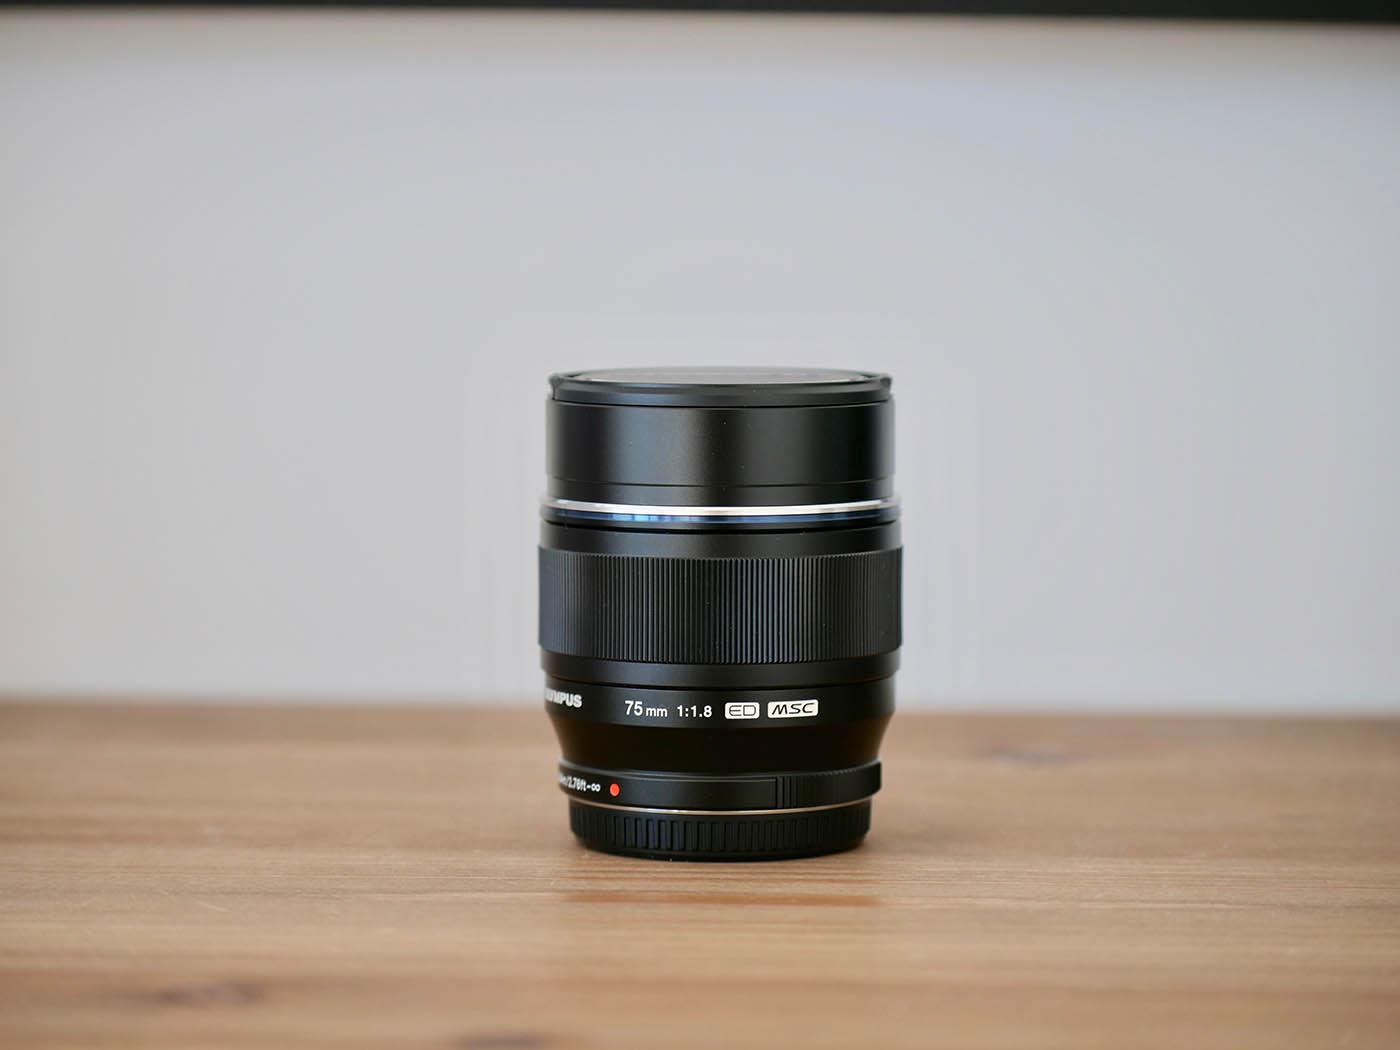 focale fixe micro 4/3 Olympus Zuiko Digital